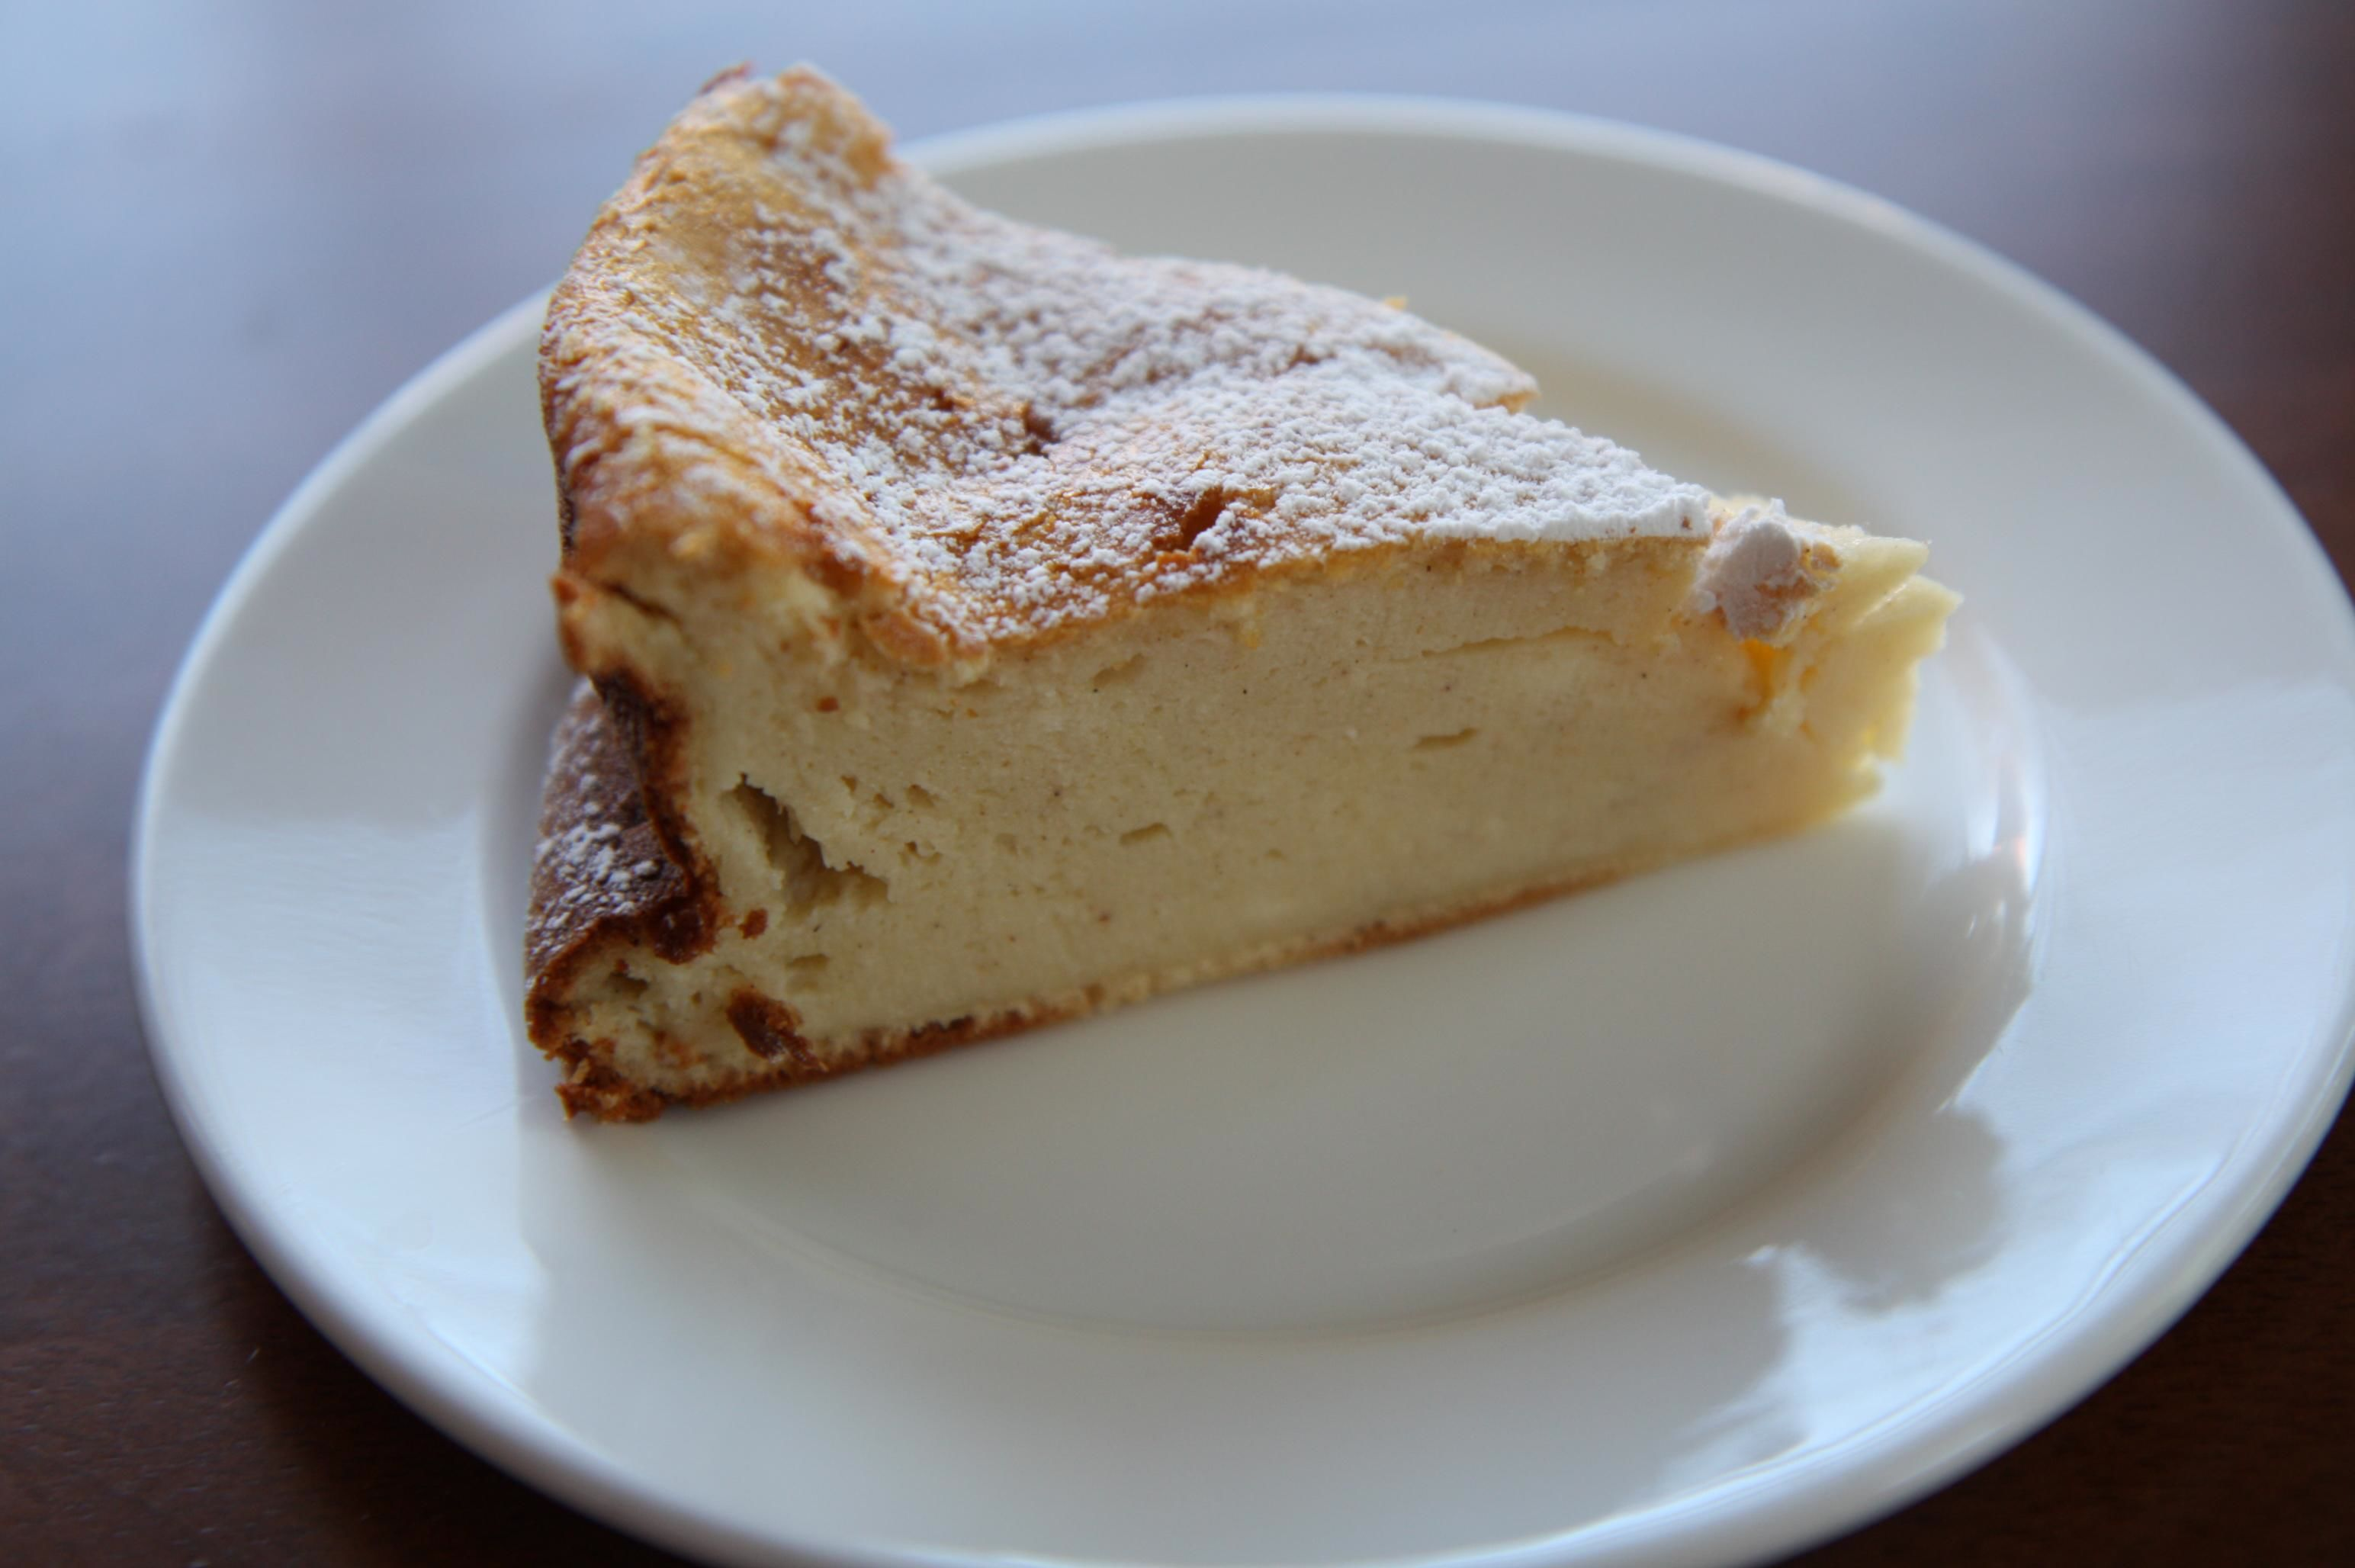 Ricotta Cake with Orange Flower Water and Honey | Erica De Mane